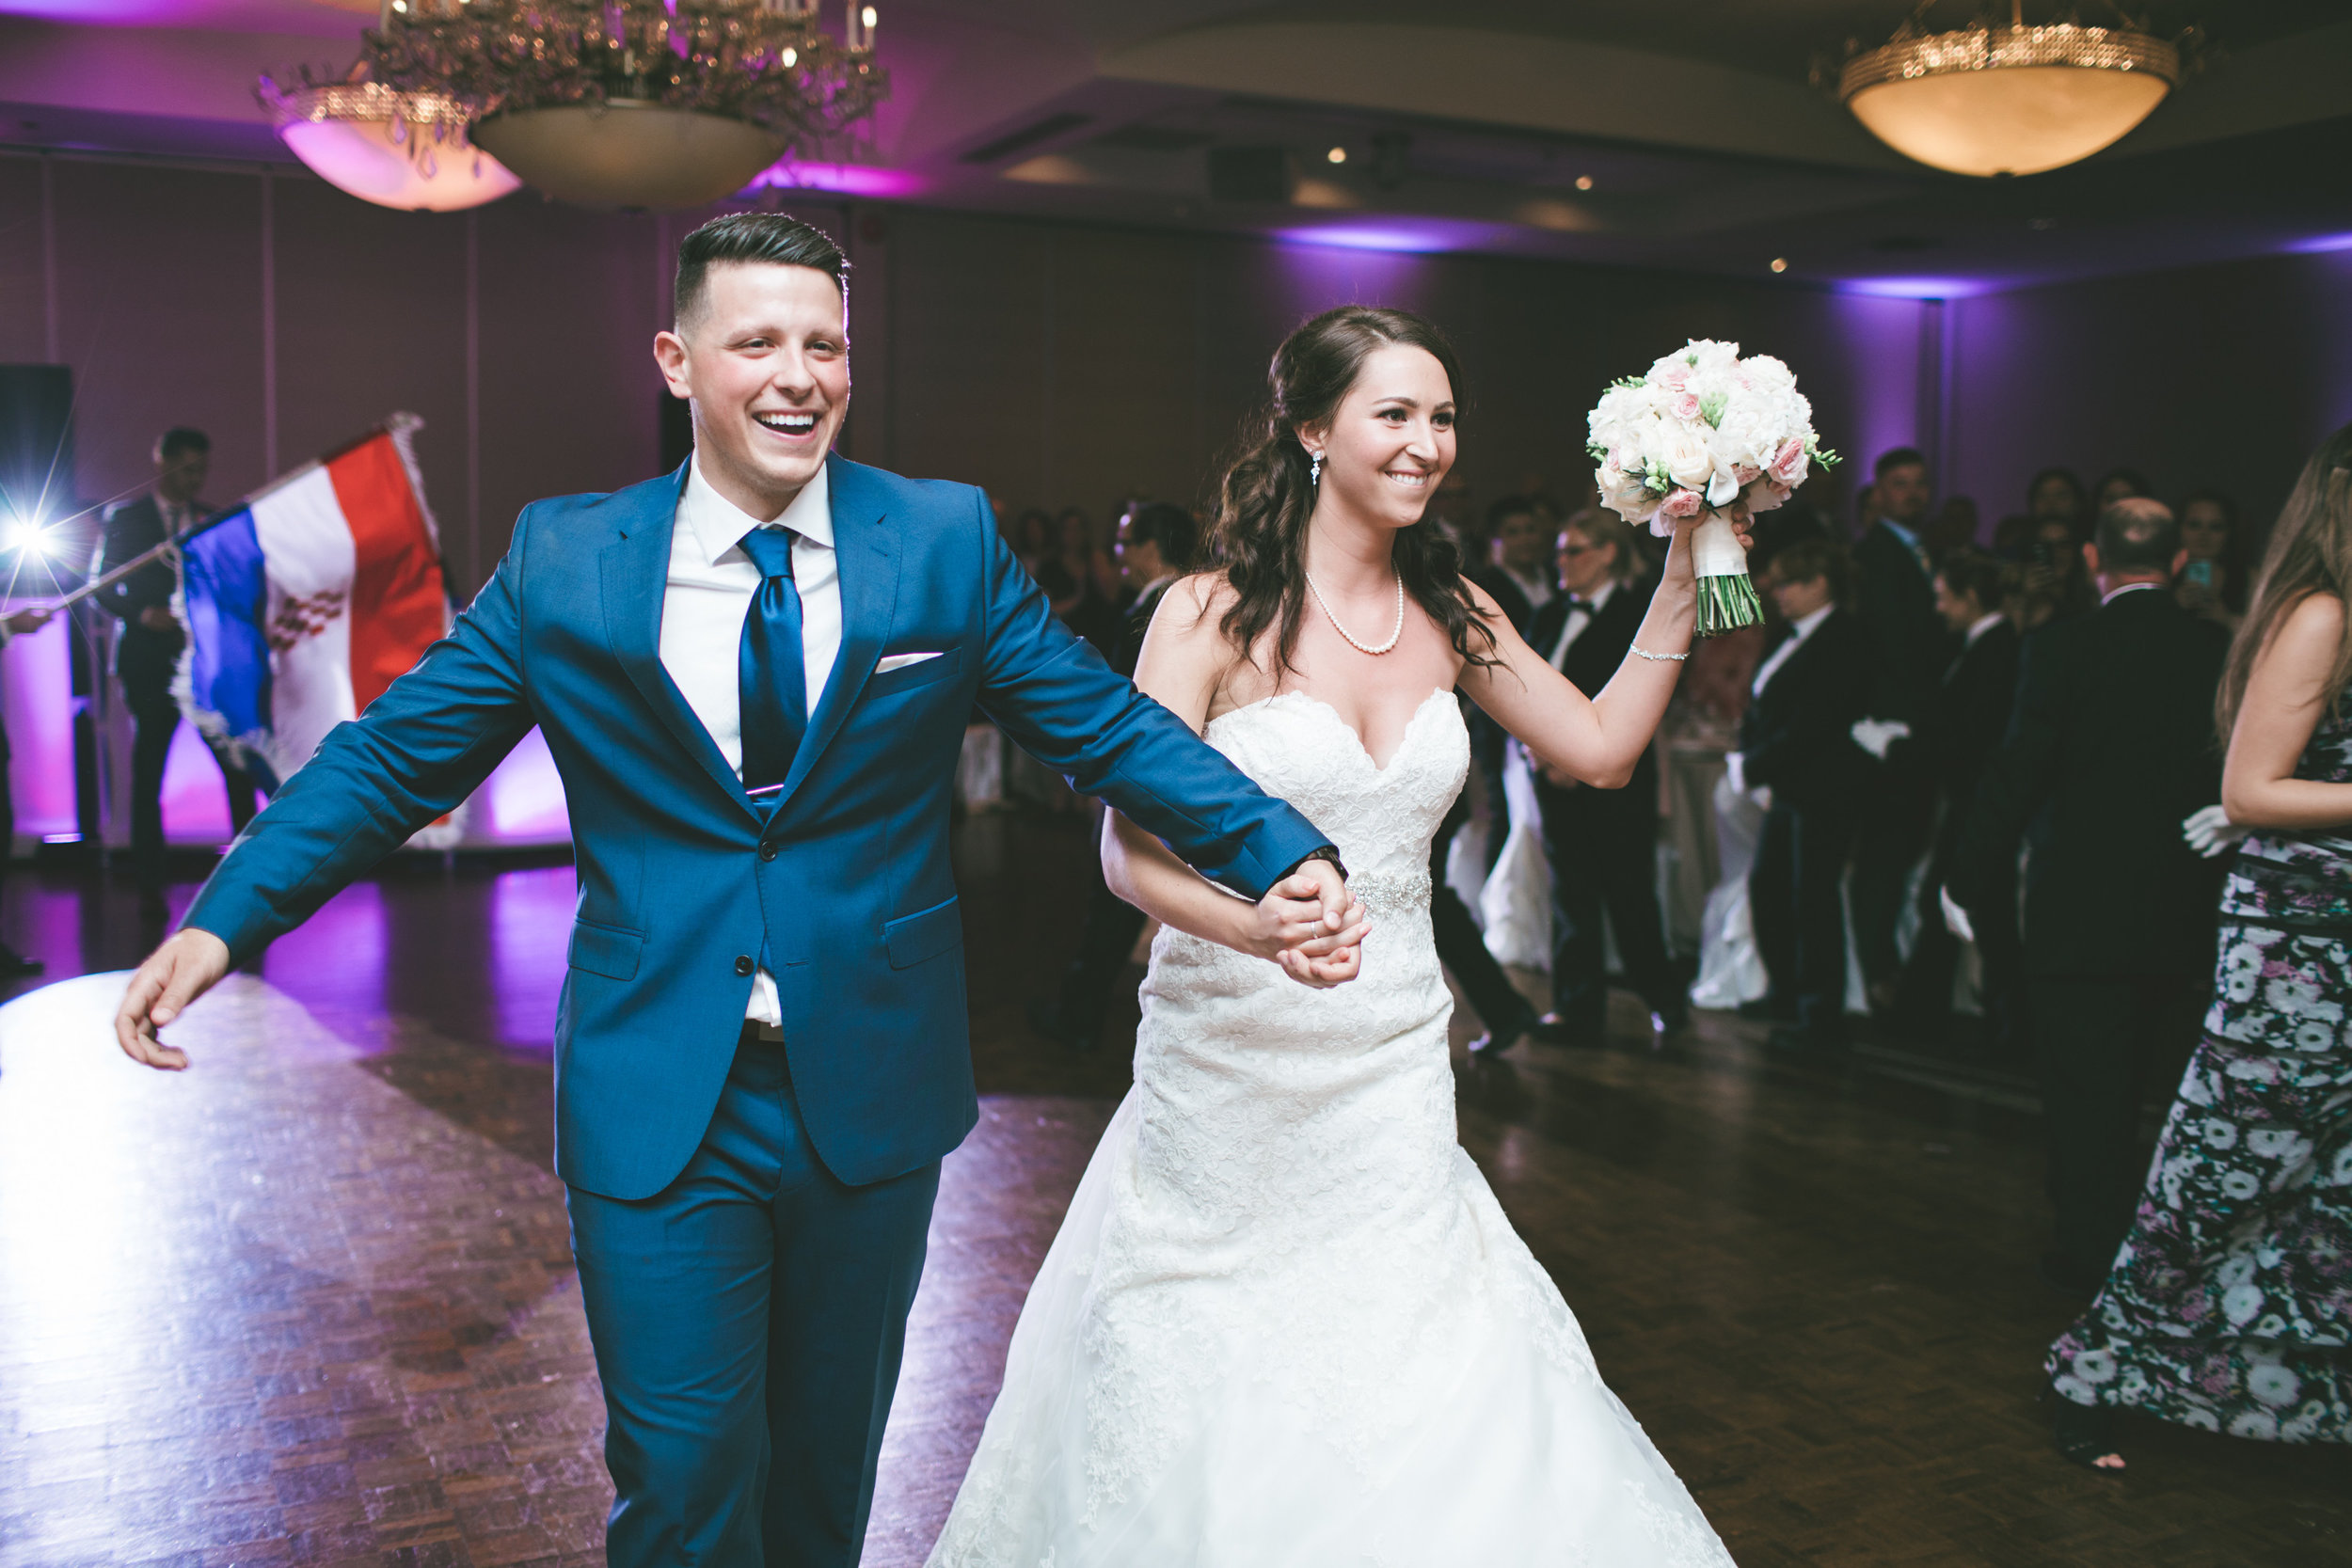 ashley___dario_wedding___lifesreel_danielcaruso___1697.jpg